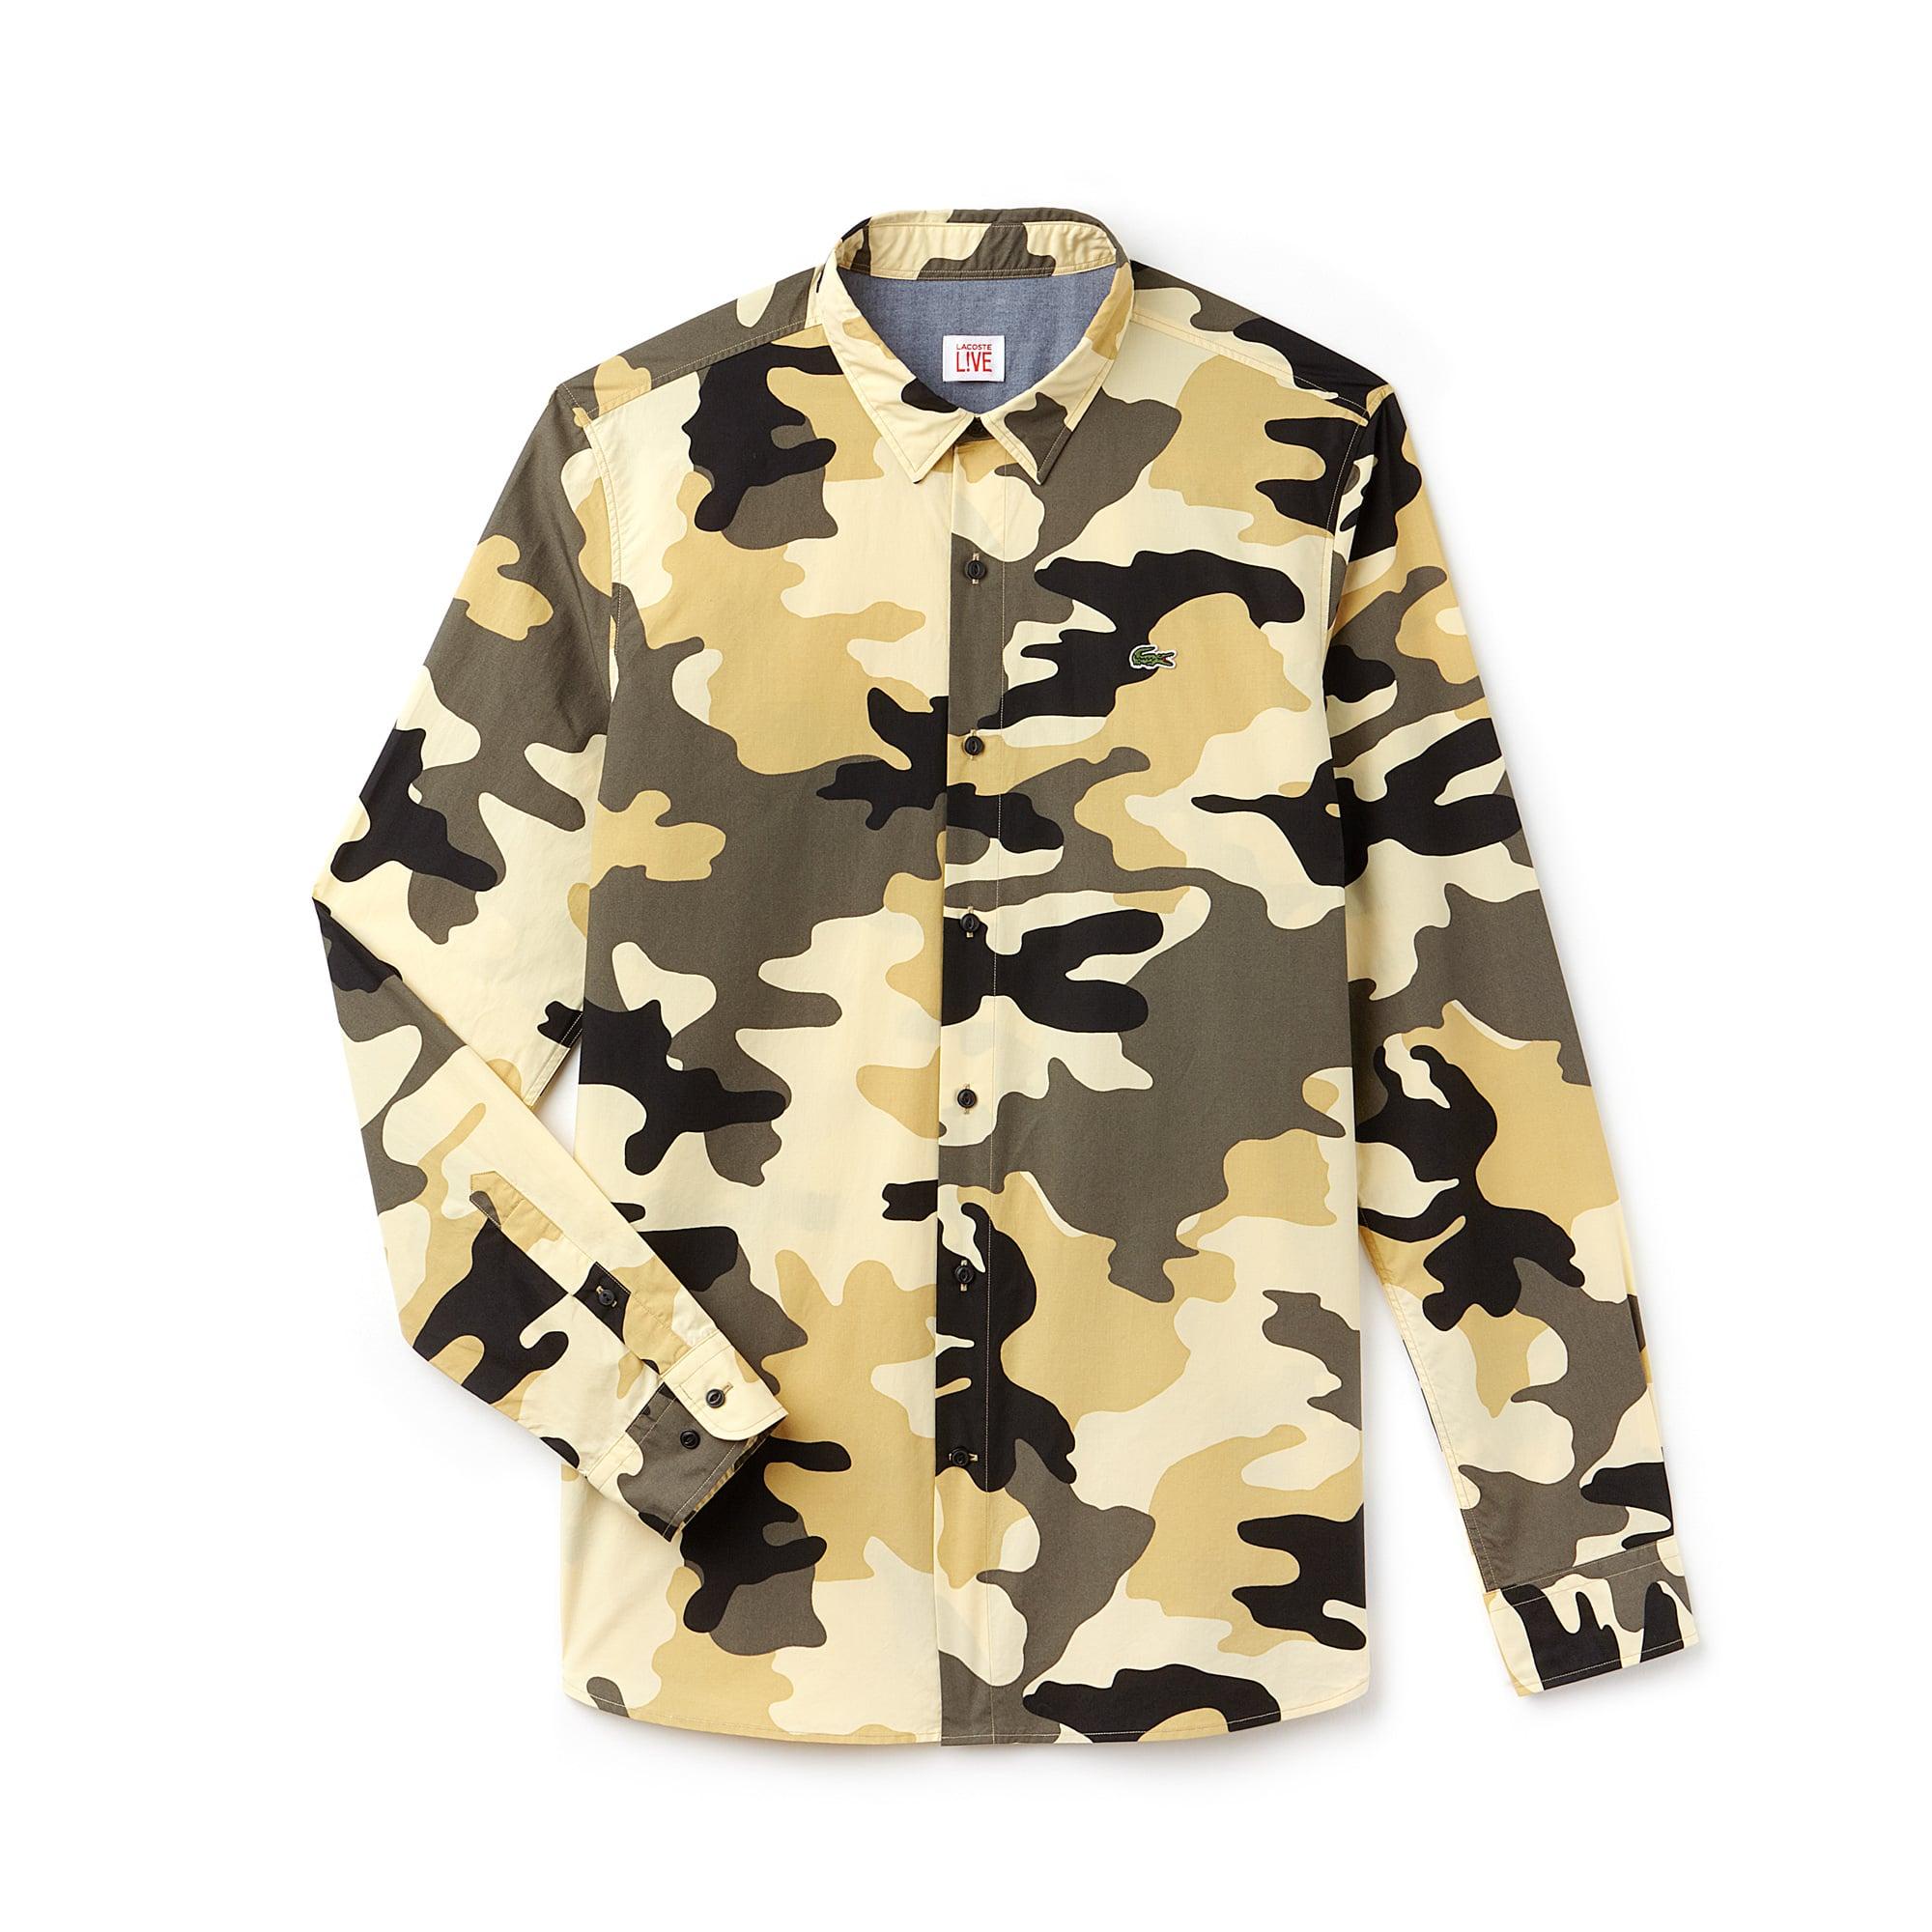 Men's Lacoste LIVE Skinny Fit Camouflage Print Poplin Shirt